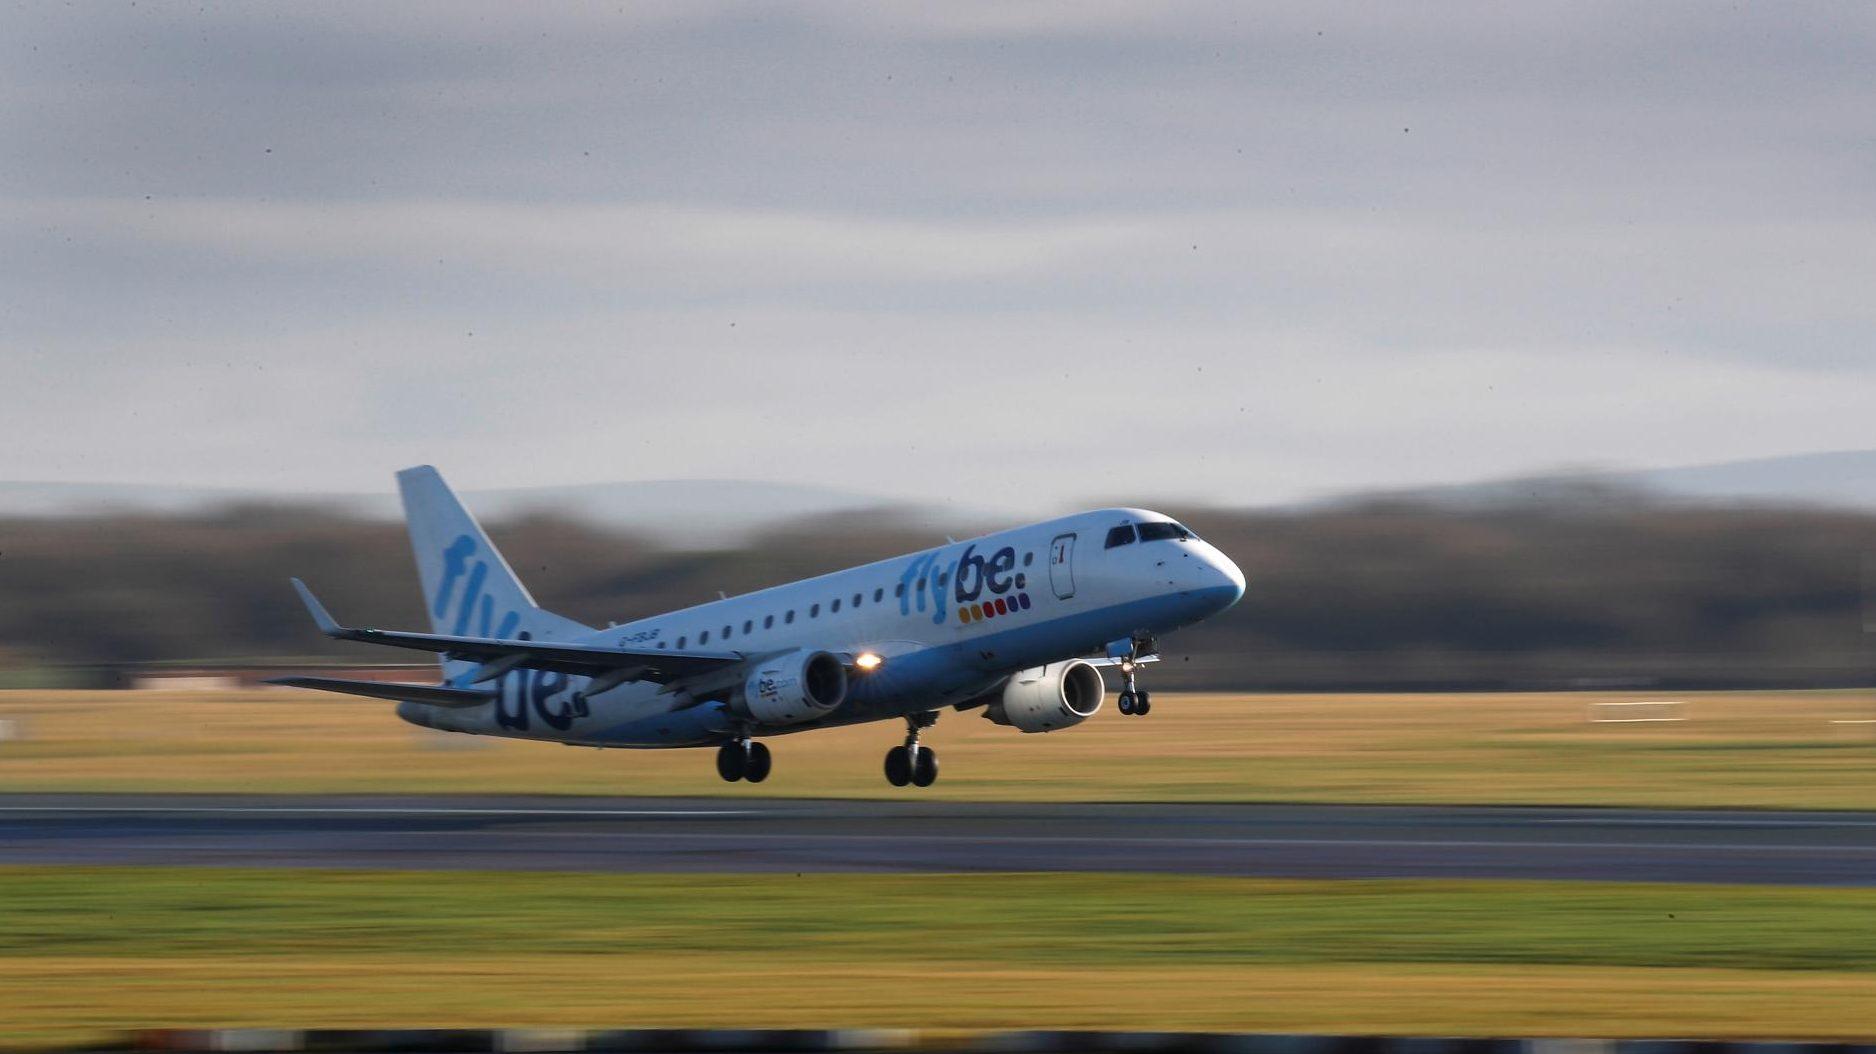 Covid 19 Vaccine Distribution Will Suffer As Air Travel Drops Quartz